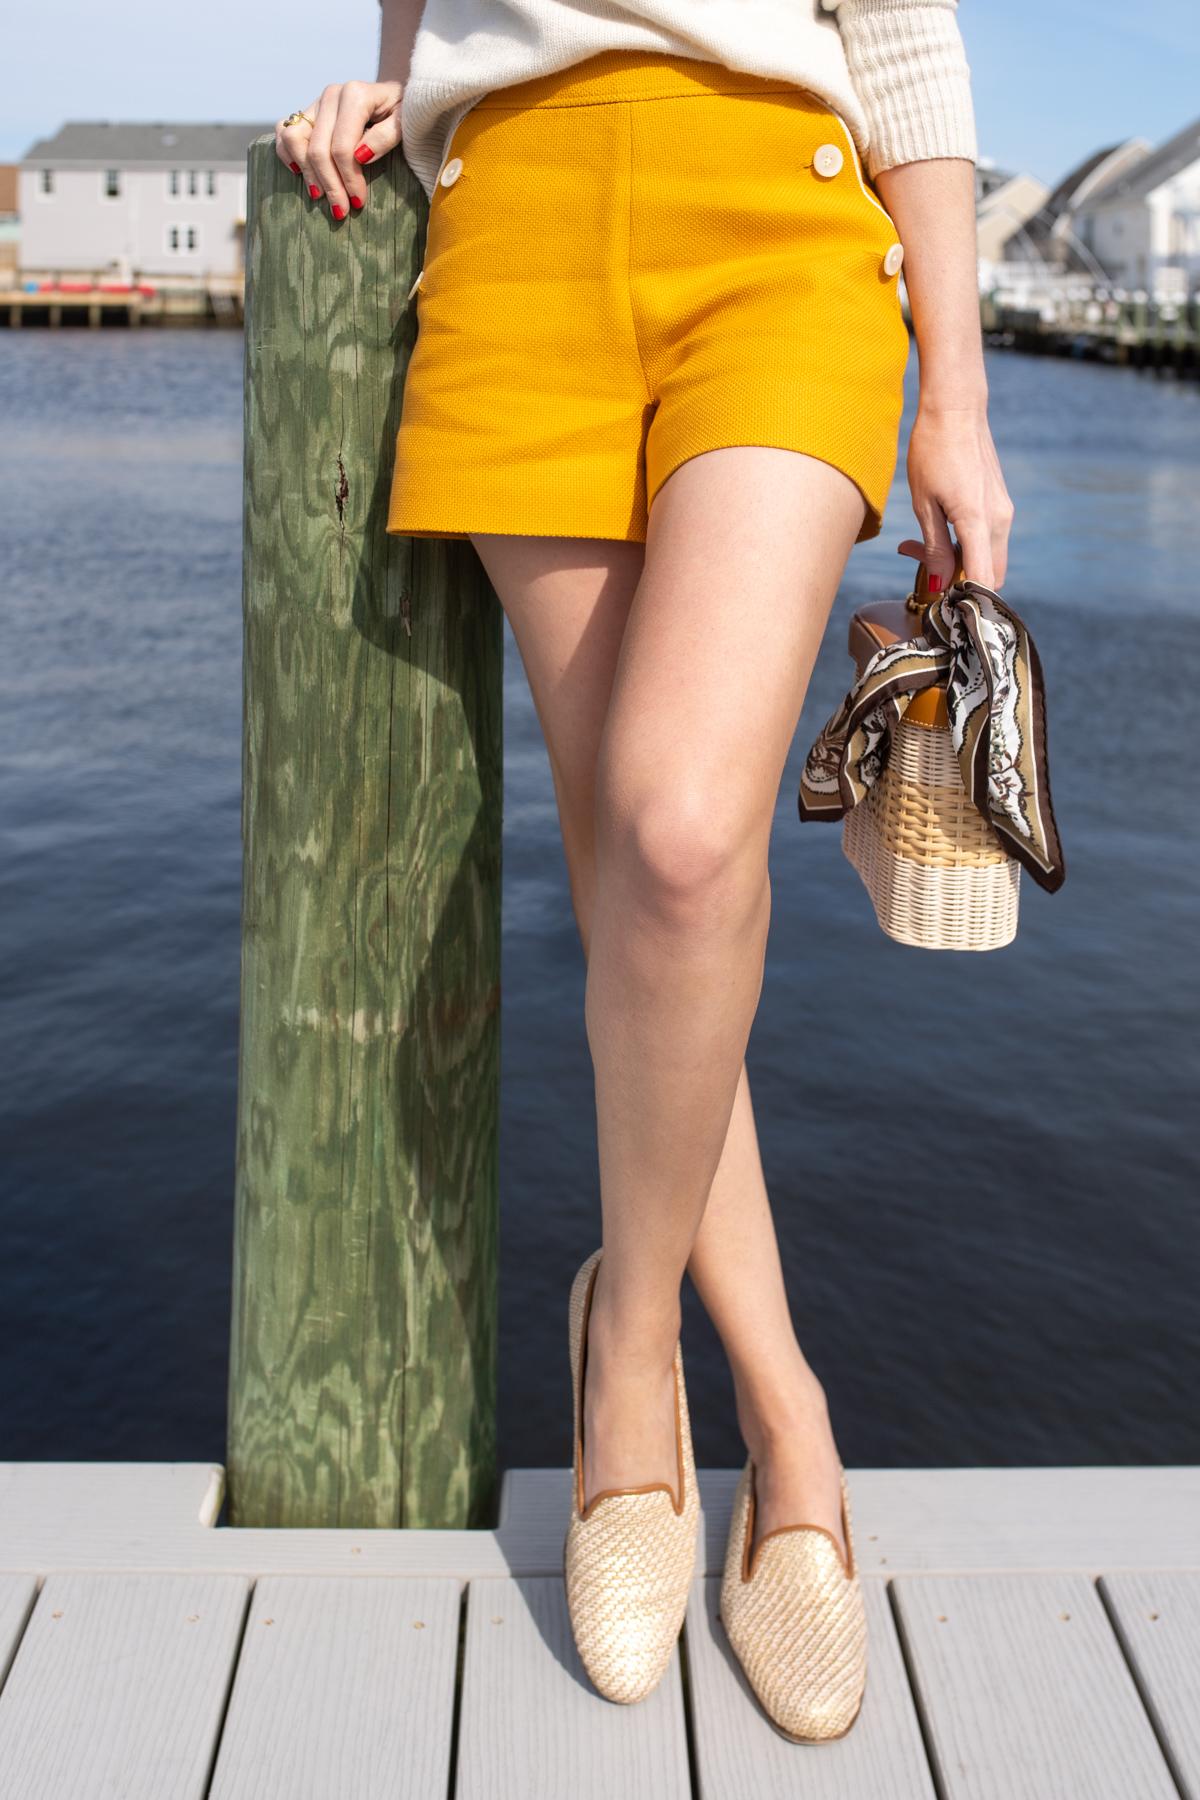 Stacie Flinner X J.Crew Sailor Shorts-5.jpg